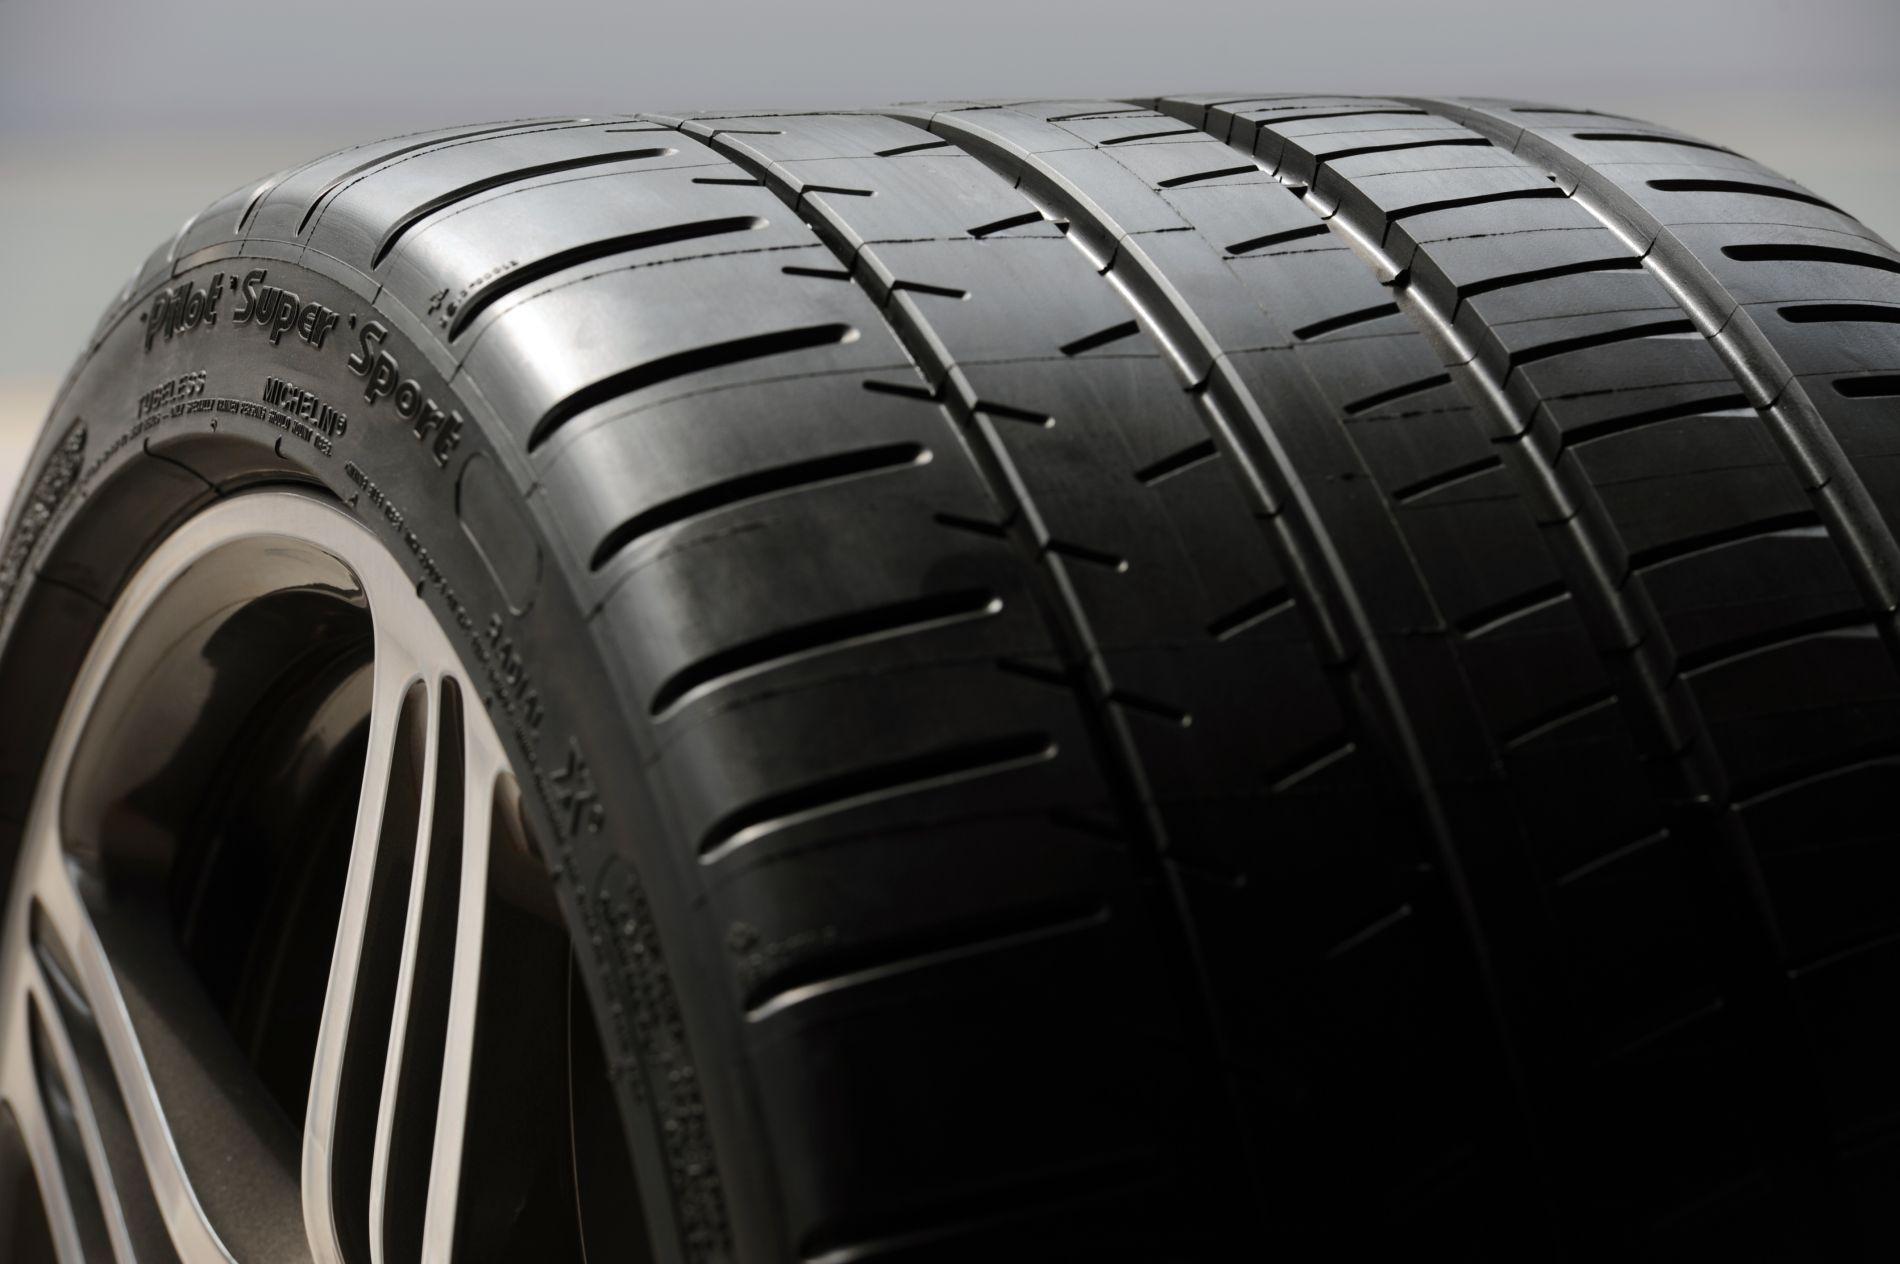 Michelin Pilot Super Sport tires Performance tyres